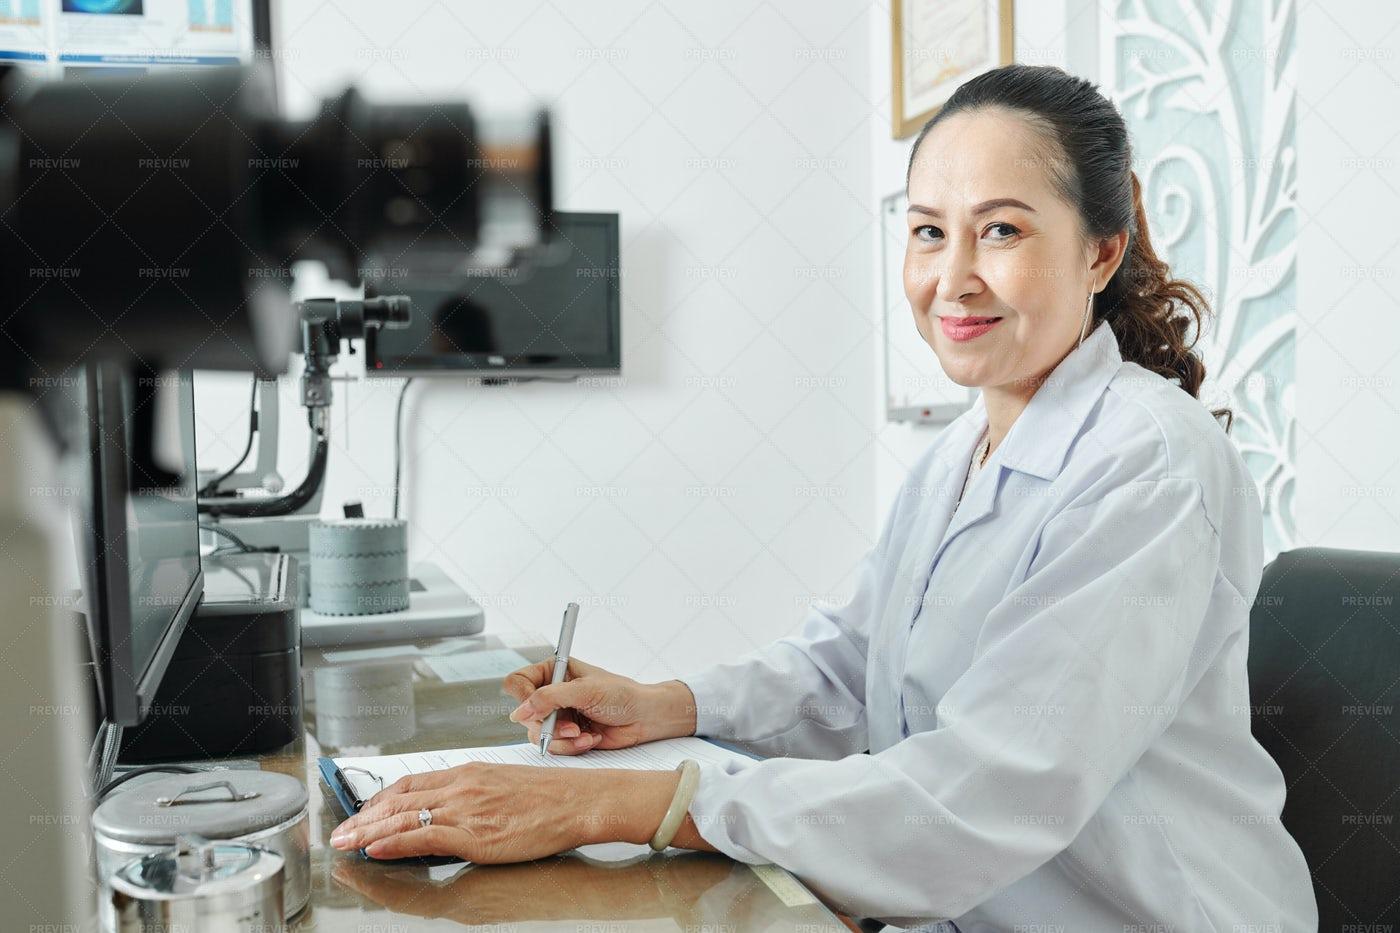 Female Optometrist At Office: Stock Photos